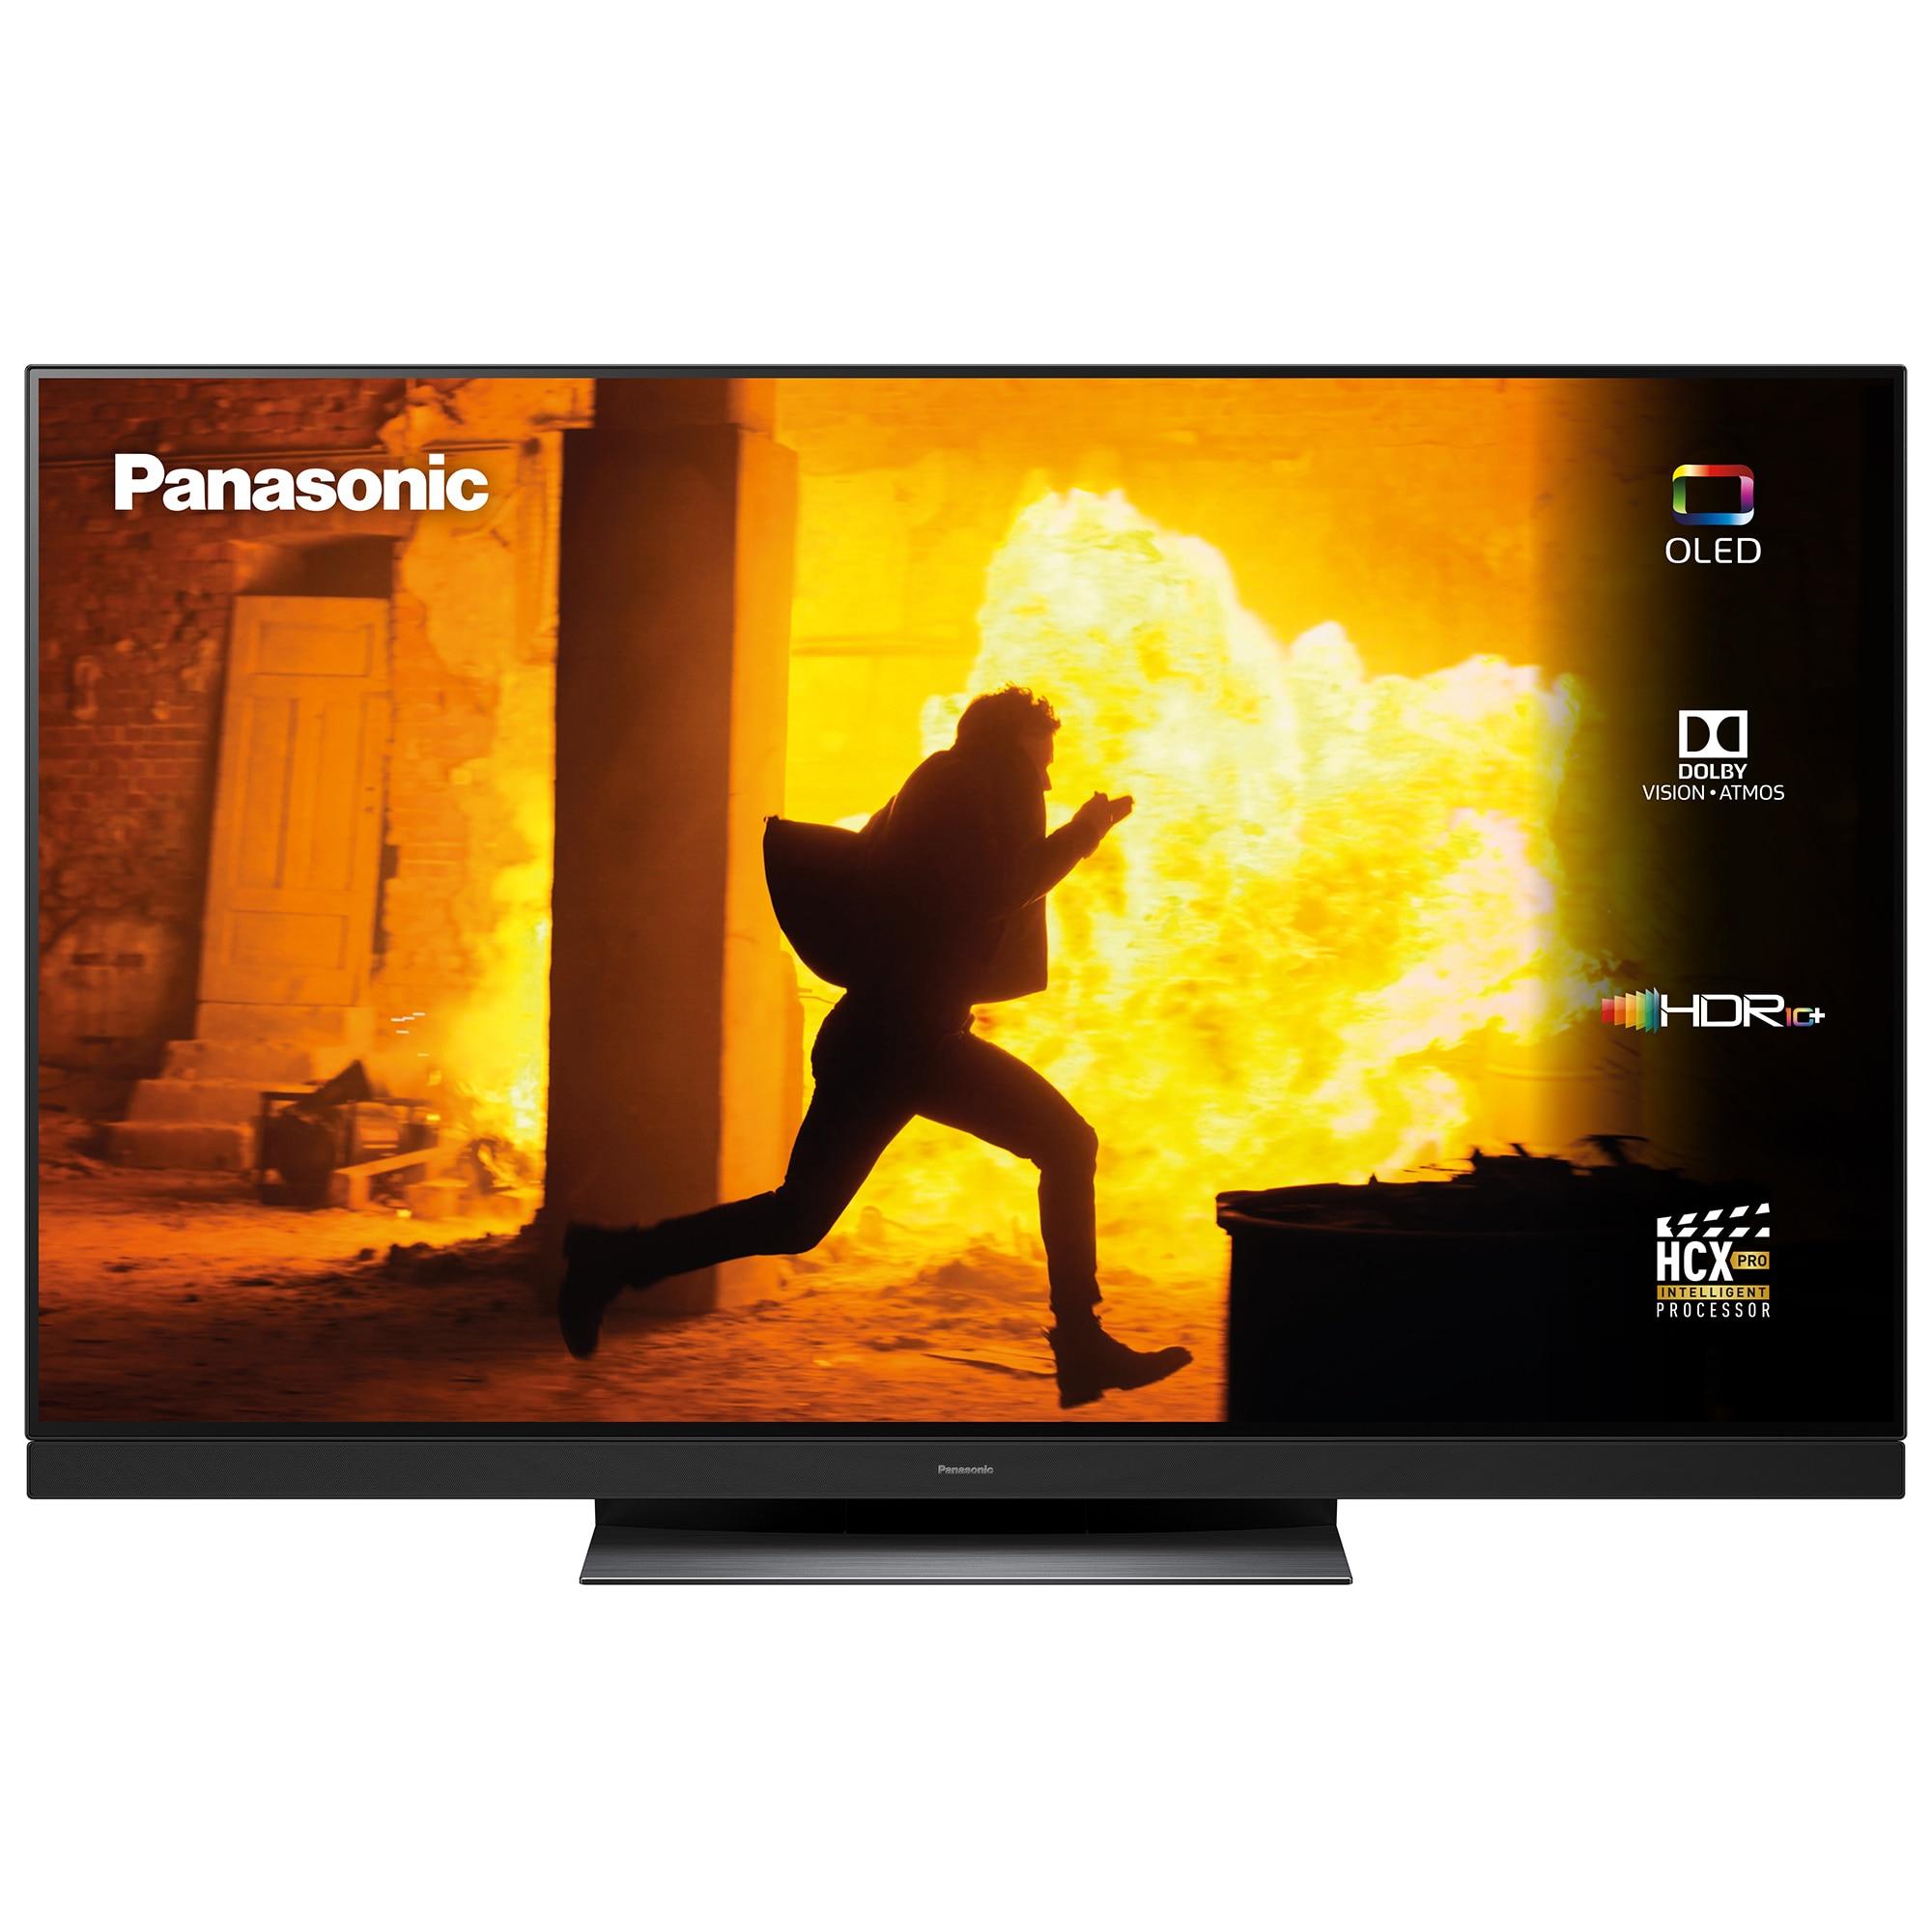 Fotografie Televizor OLED Smart Panasonic, 139 cm, TX-55GZ1500E, 4K Ultra HD, Clasa A